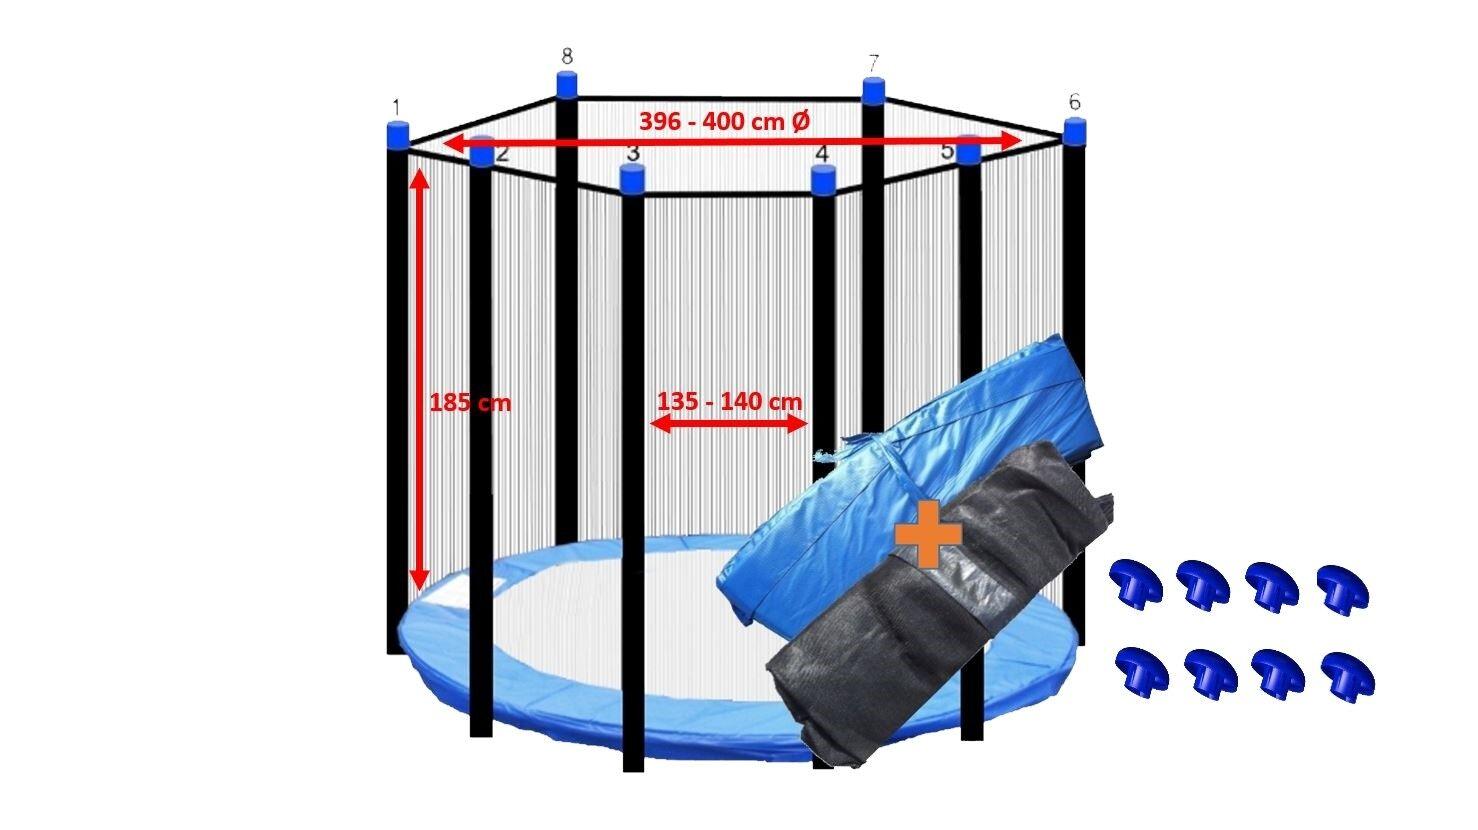 Trampolino Copertura Bordo Blu  RETE DI SICUREZZA 396400 cm Ø per 8 aste sistema